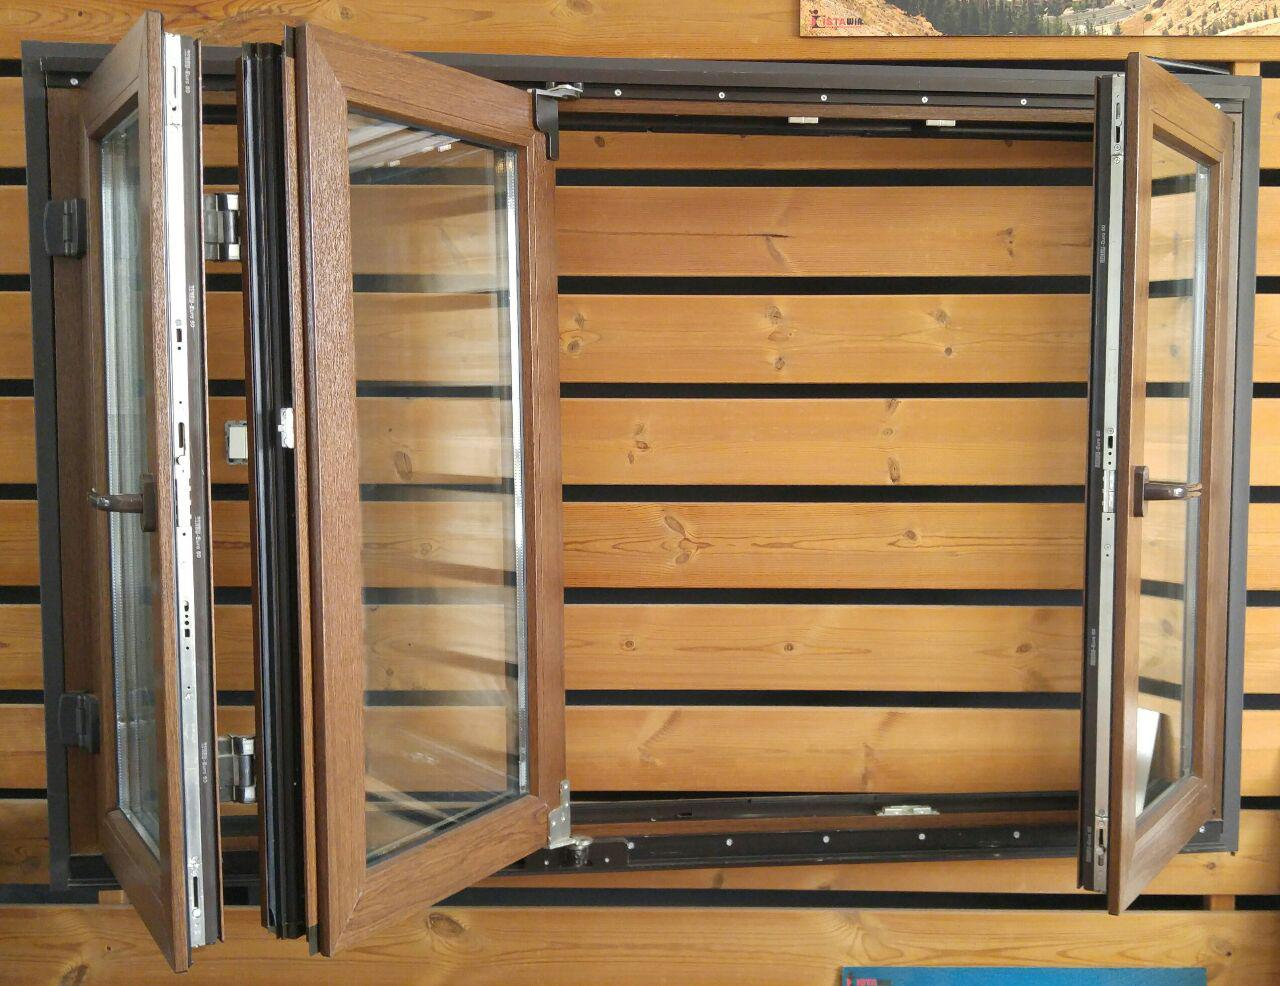 درب و پنجره آکاردئونی یو پی وی سی uPVC Fold & Slide doors and window